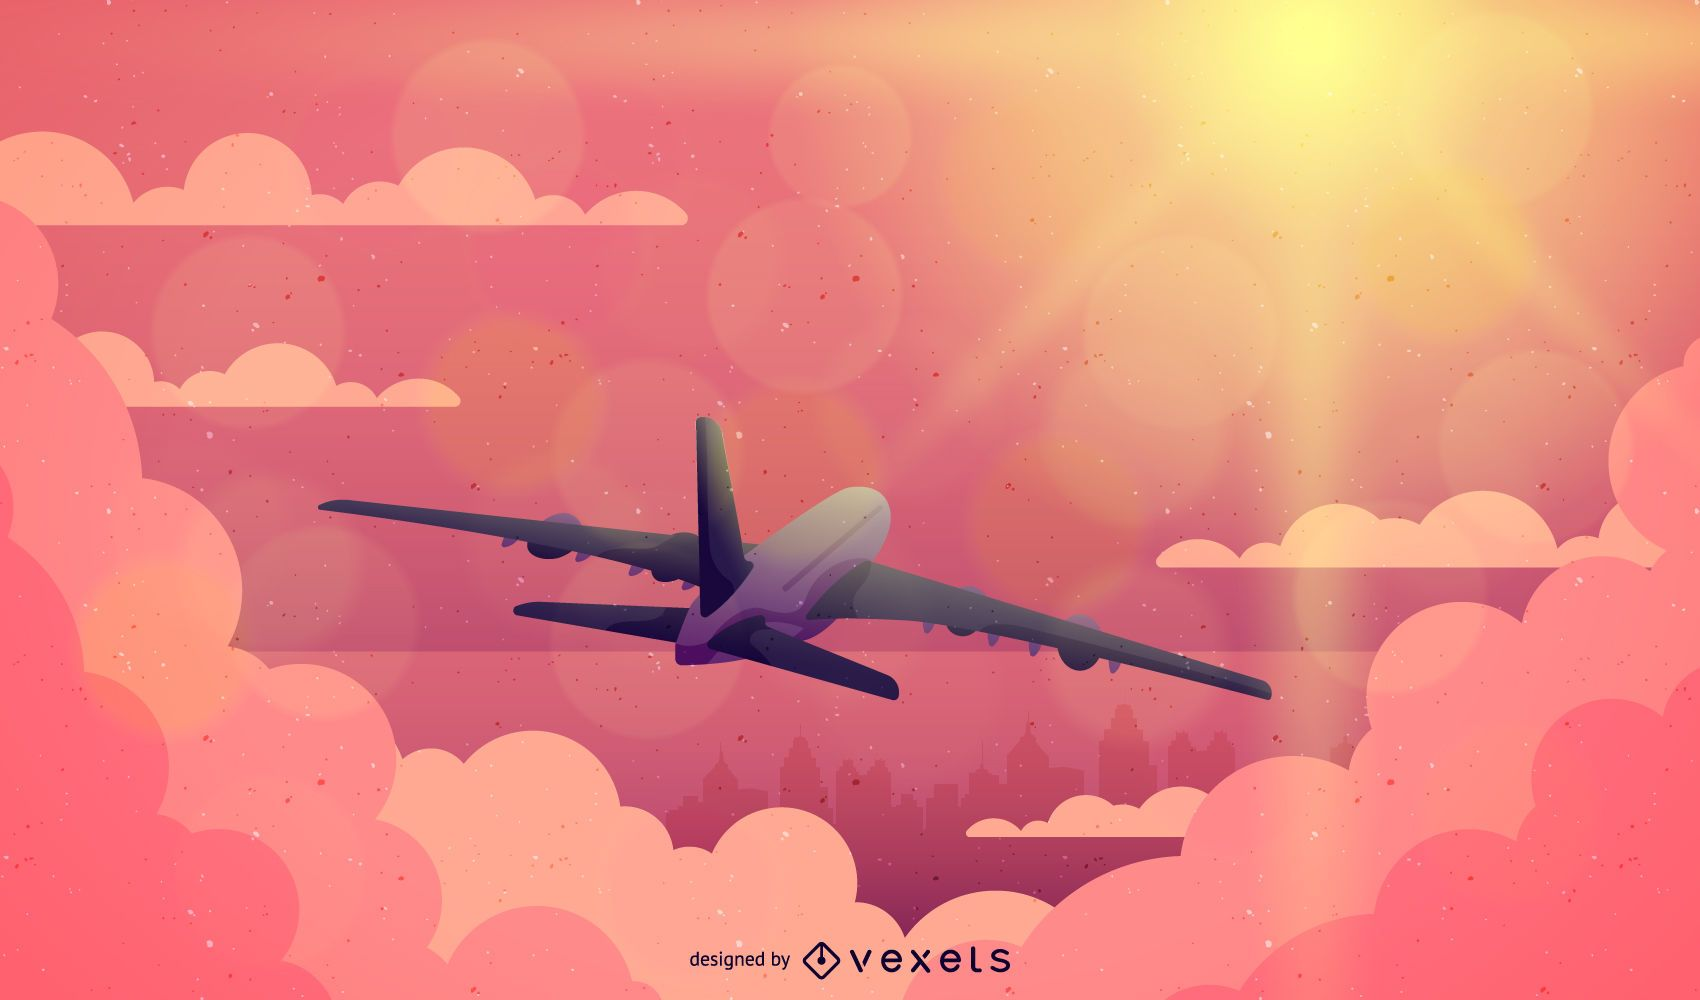 Plane flying on the sunset illustration